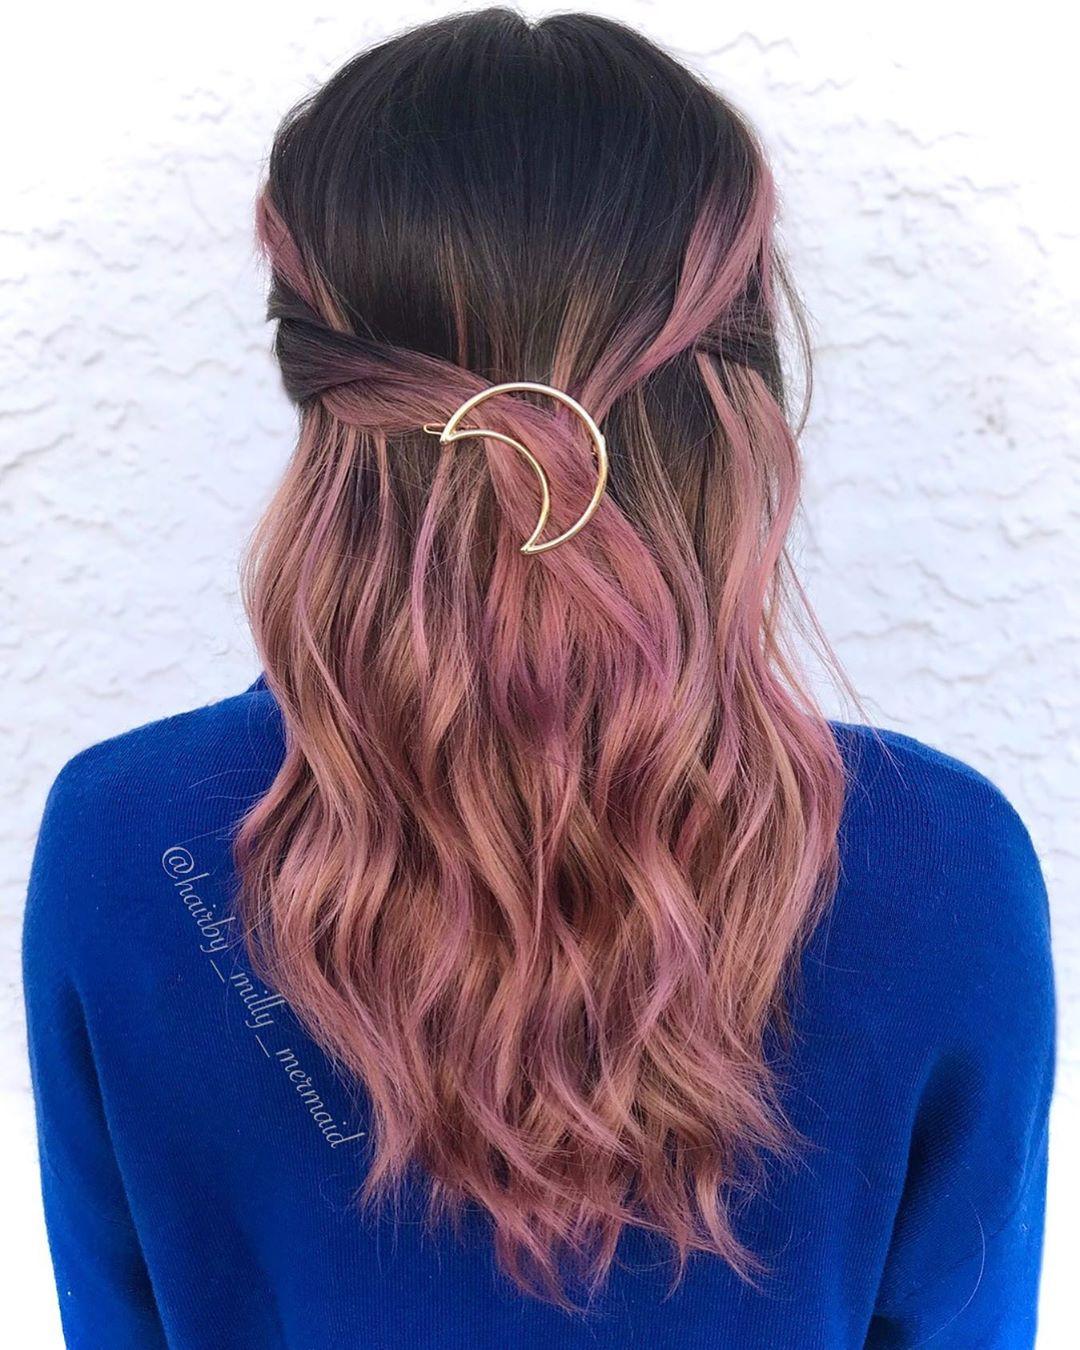 Rose Gold Tint Hair Color Idea